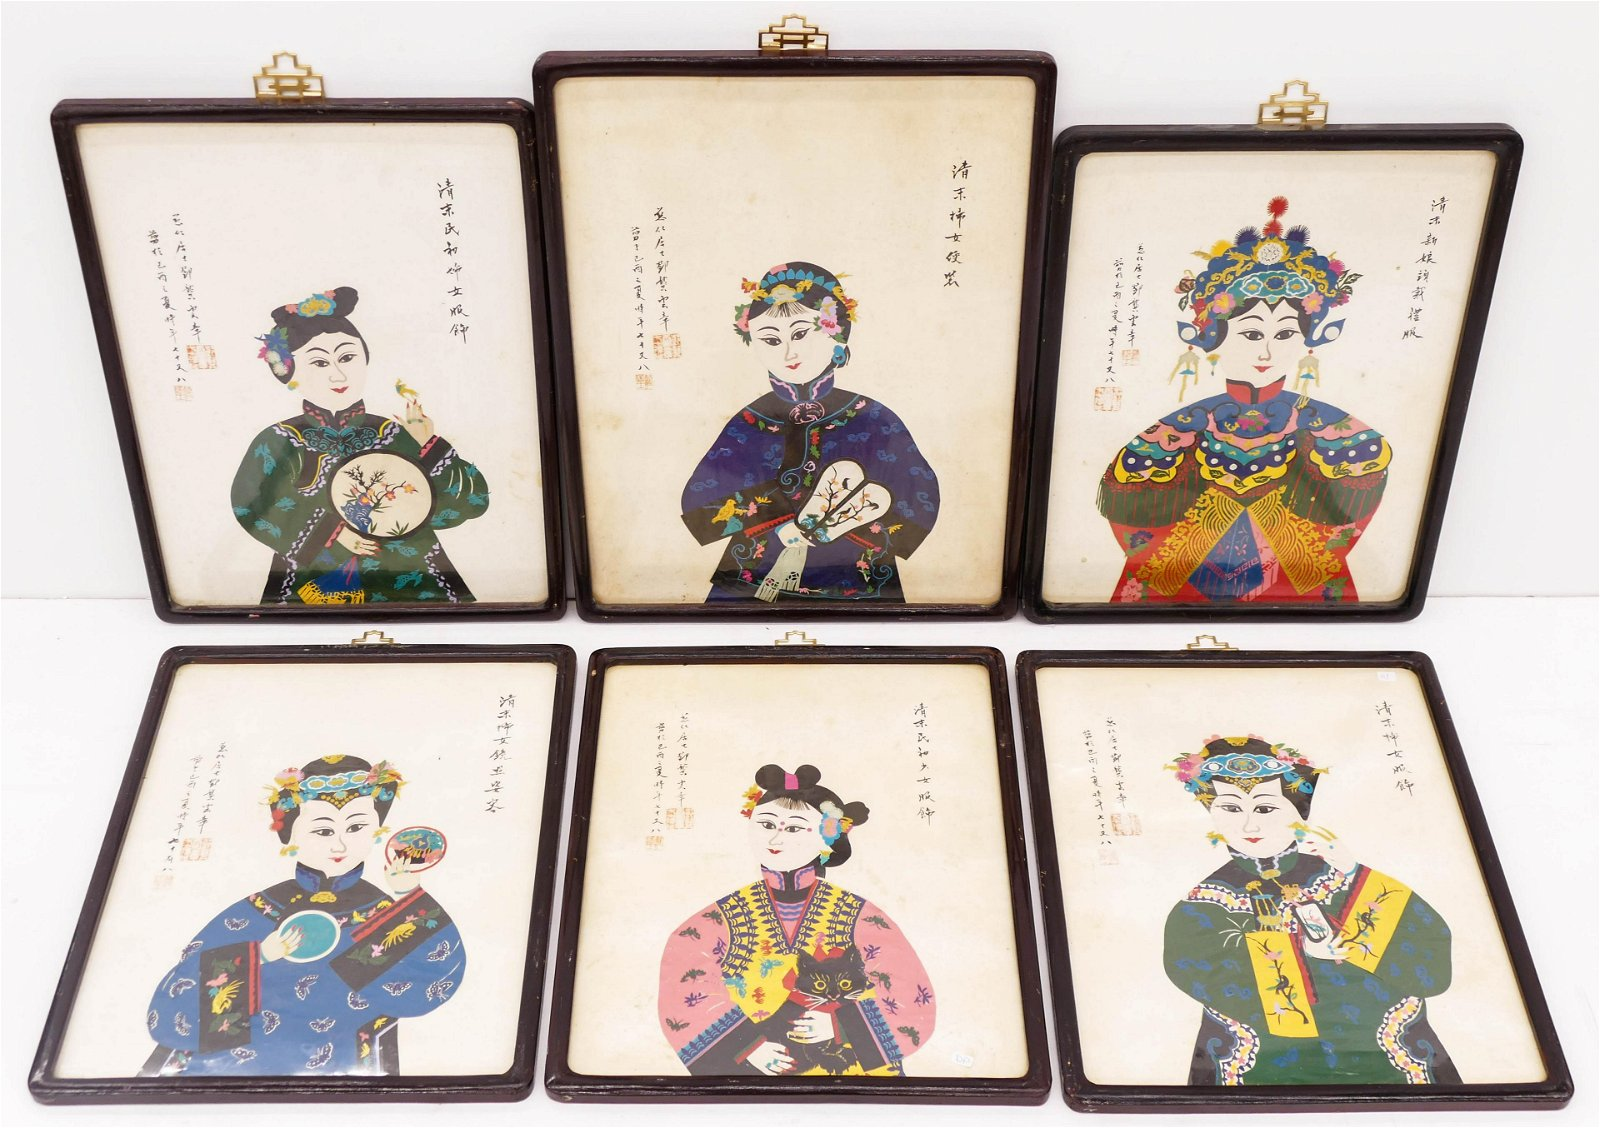 6pc Chinese Grandma Teng Woodcut Artworks. Includes six